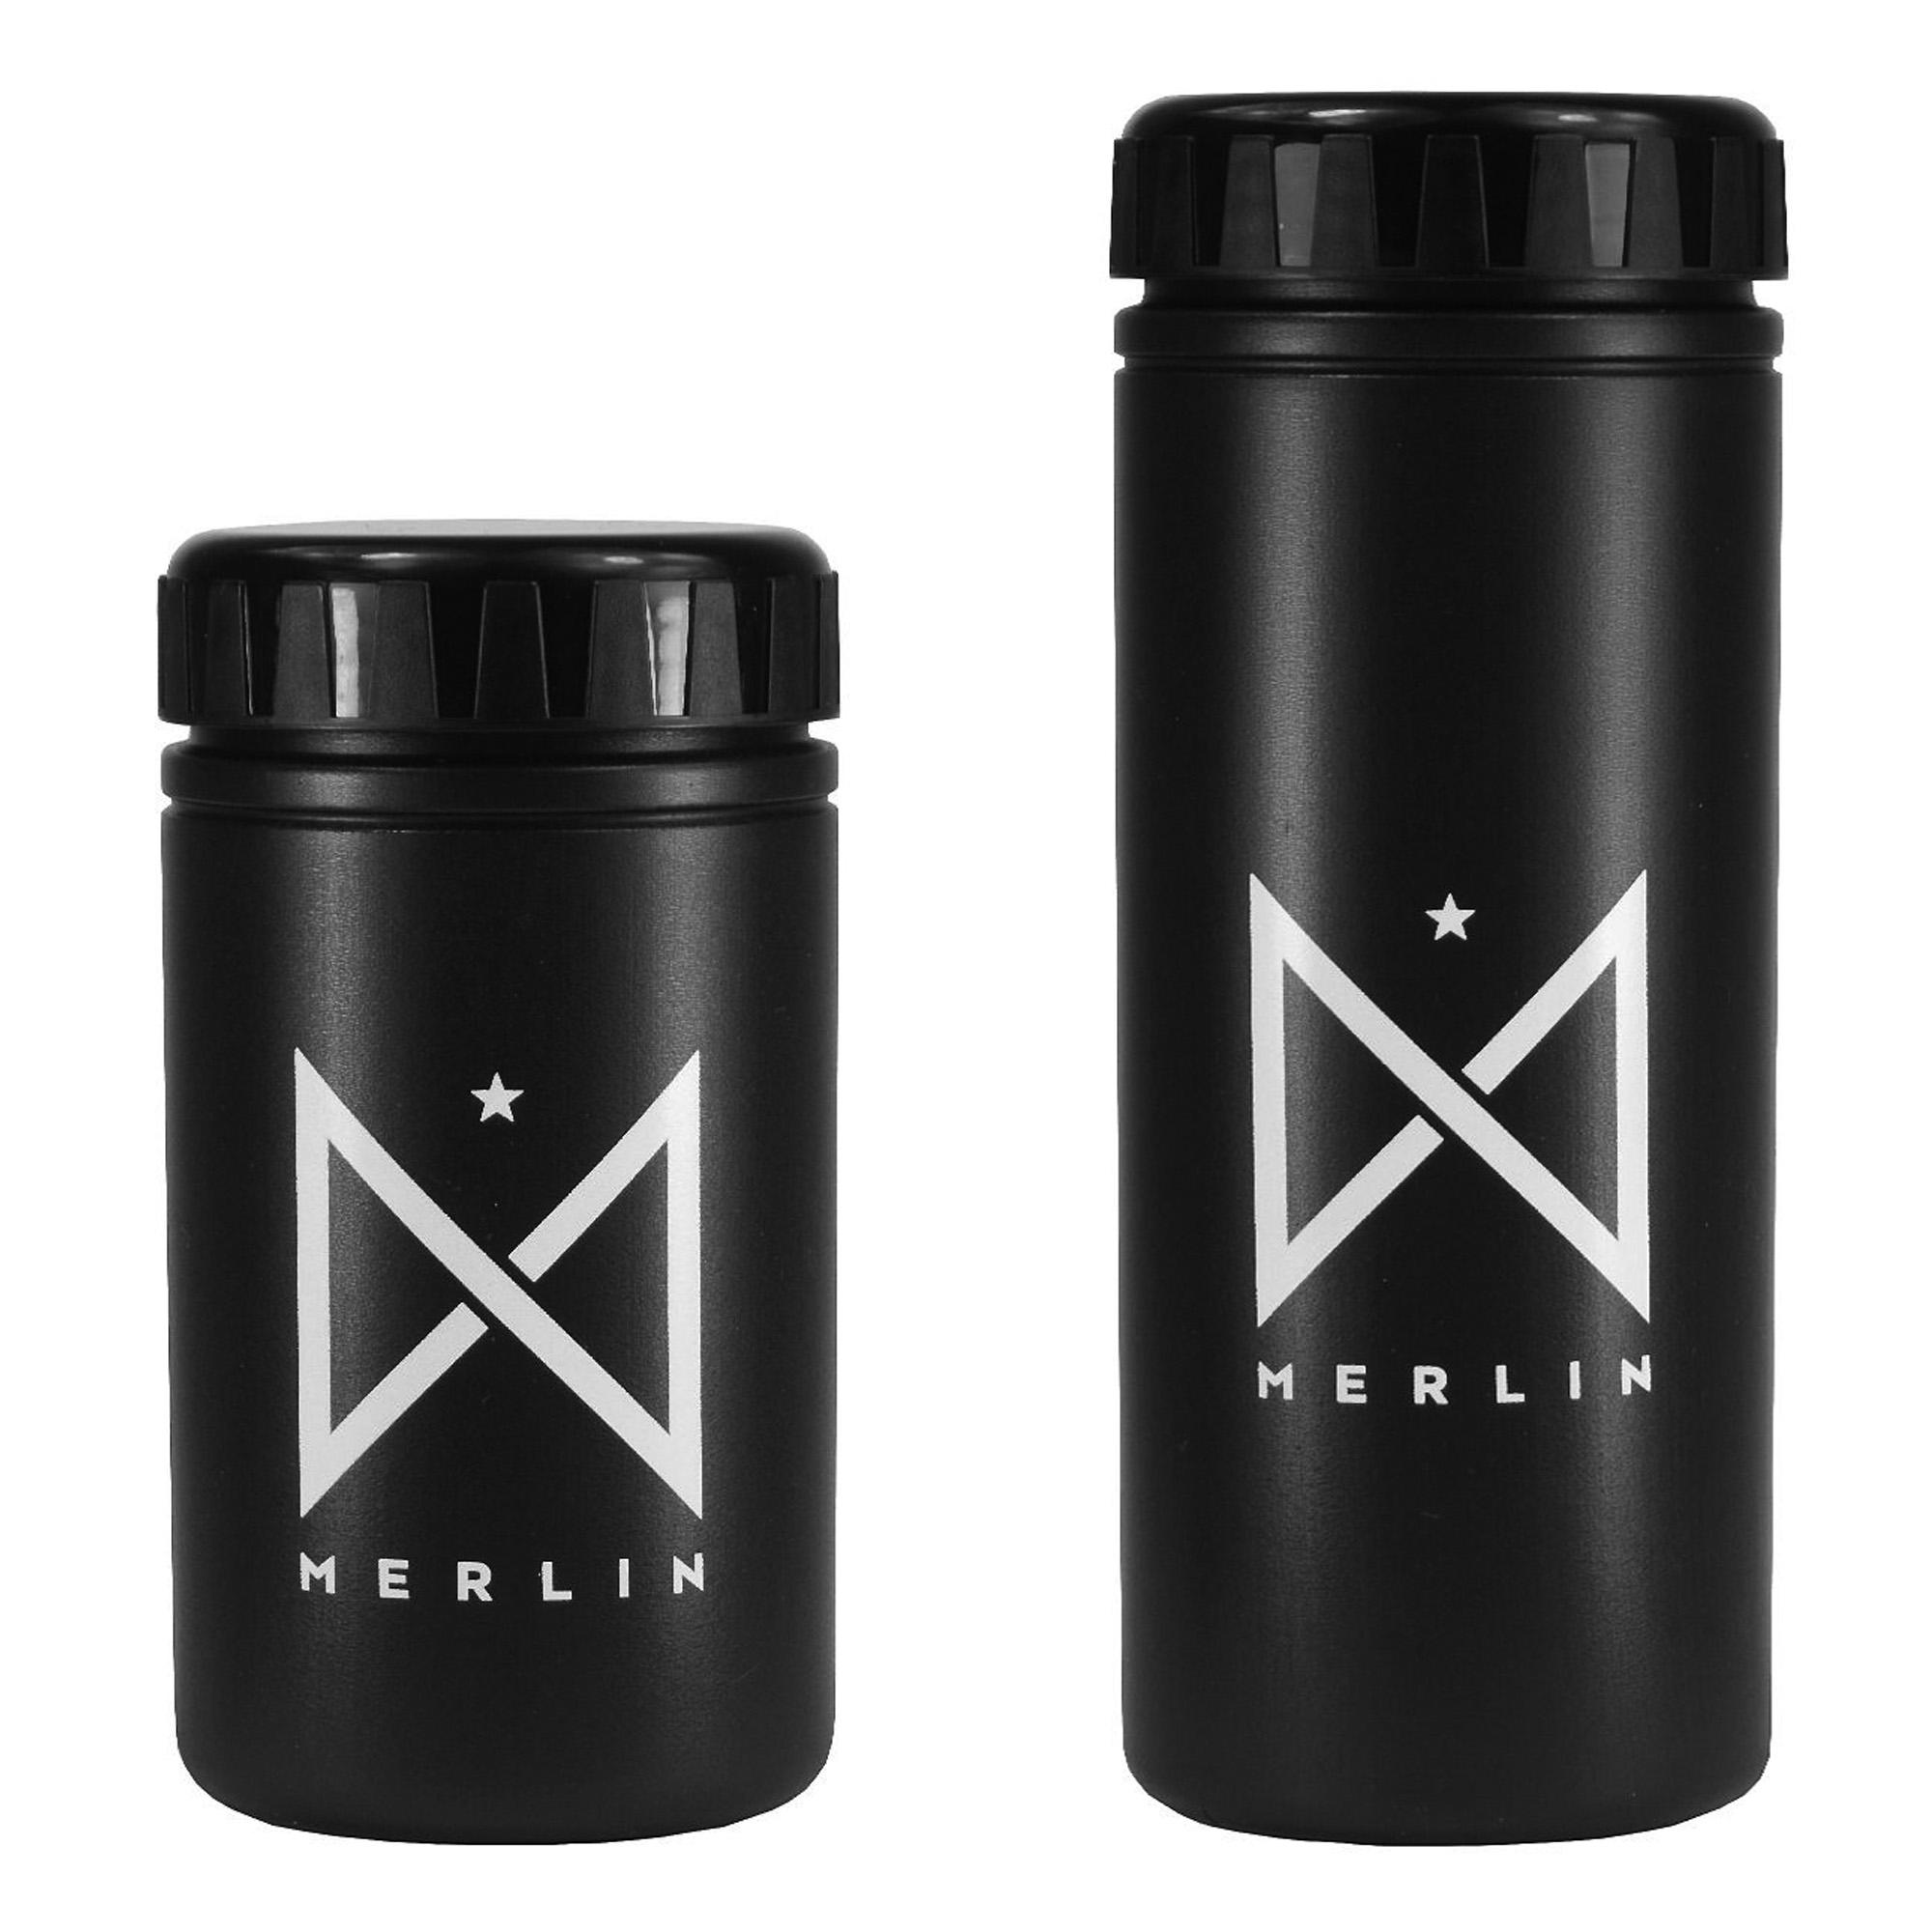 Merlin Tool Bottle